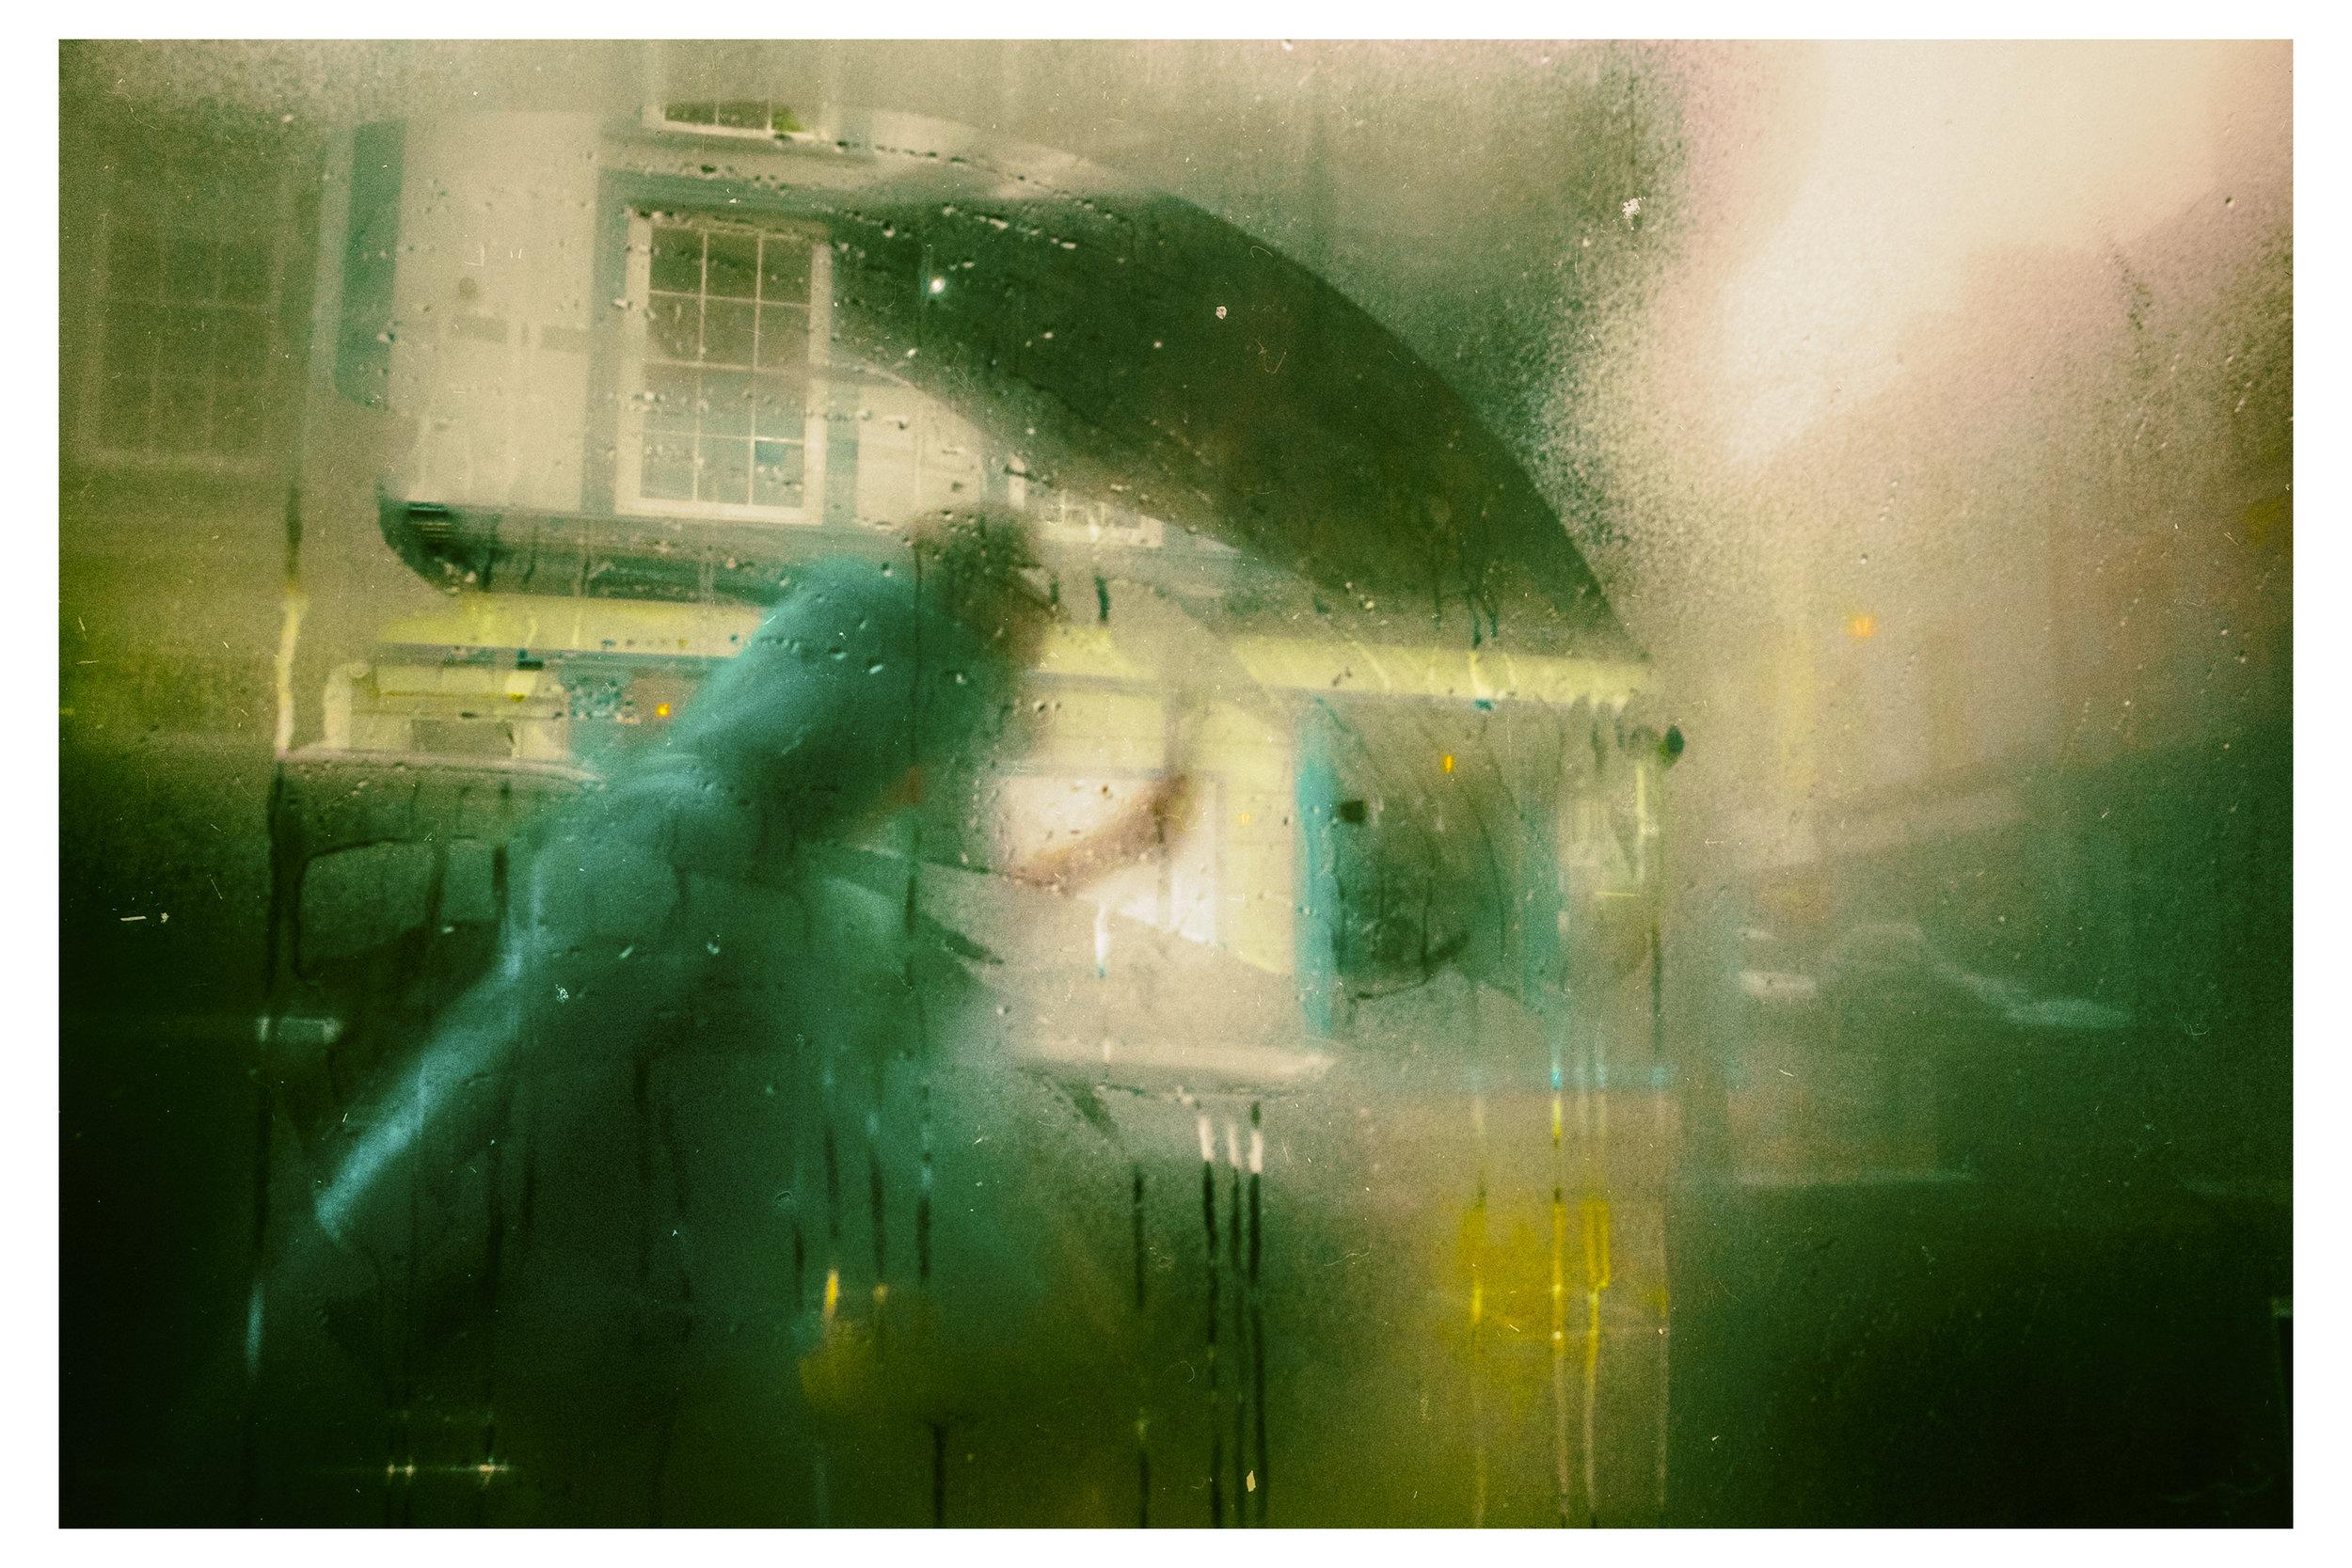 Cabin to street through misty windows -1143-Edit-Edit-2 - Copy - Copy.jpg